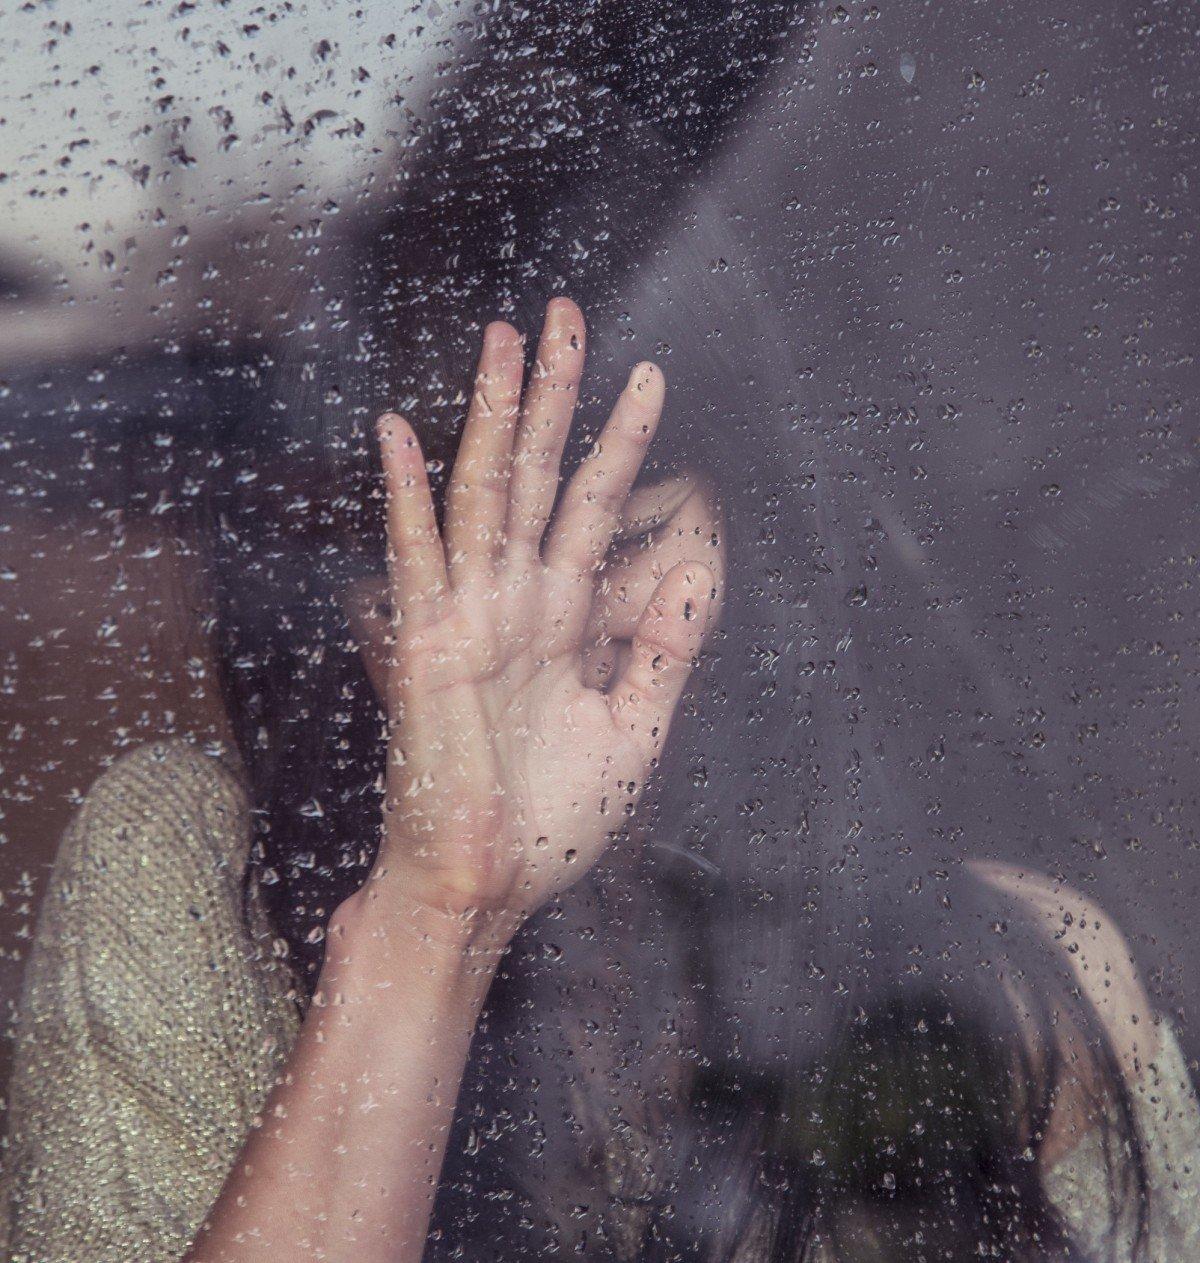 Mujer llorando contra ventana en día lluvioso. | Imagen: PxHere